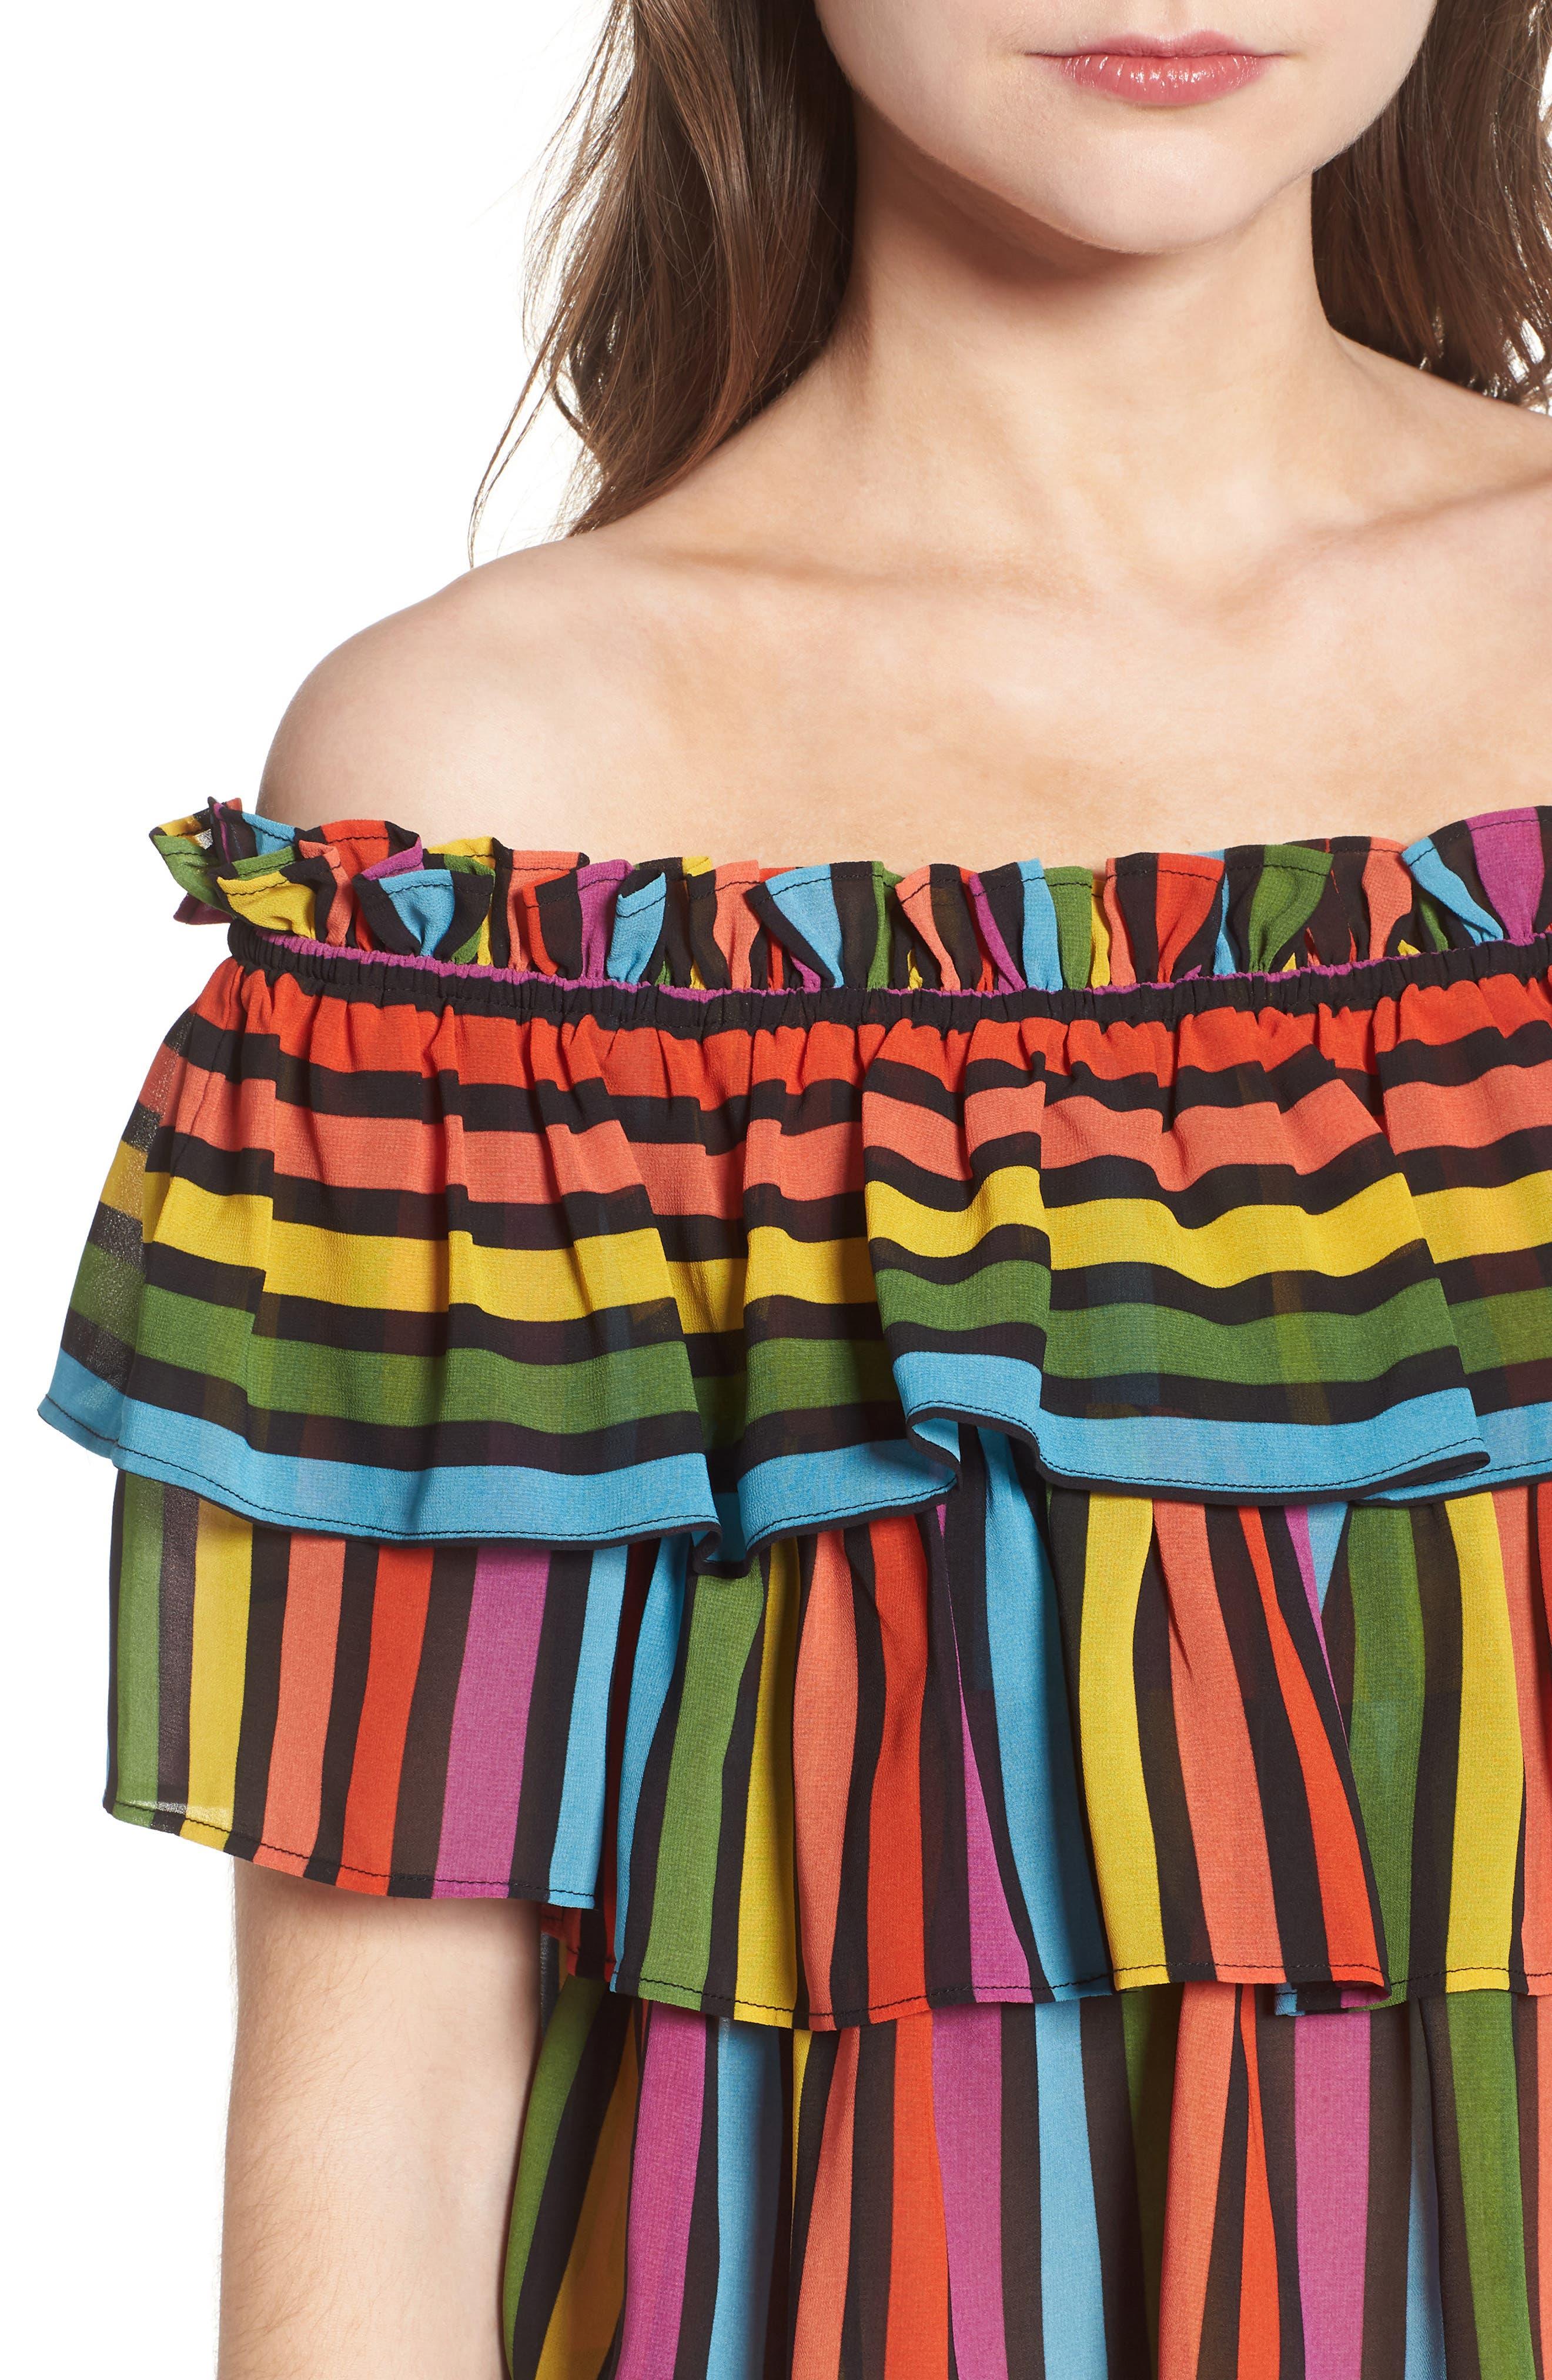 Toulon Tiered Ruffle Top,                             Alternate thumbnail 4, color,                             Rainbow Stripe